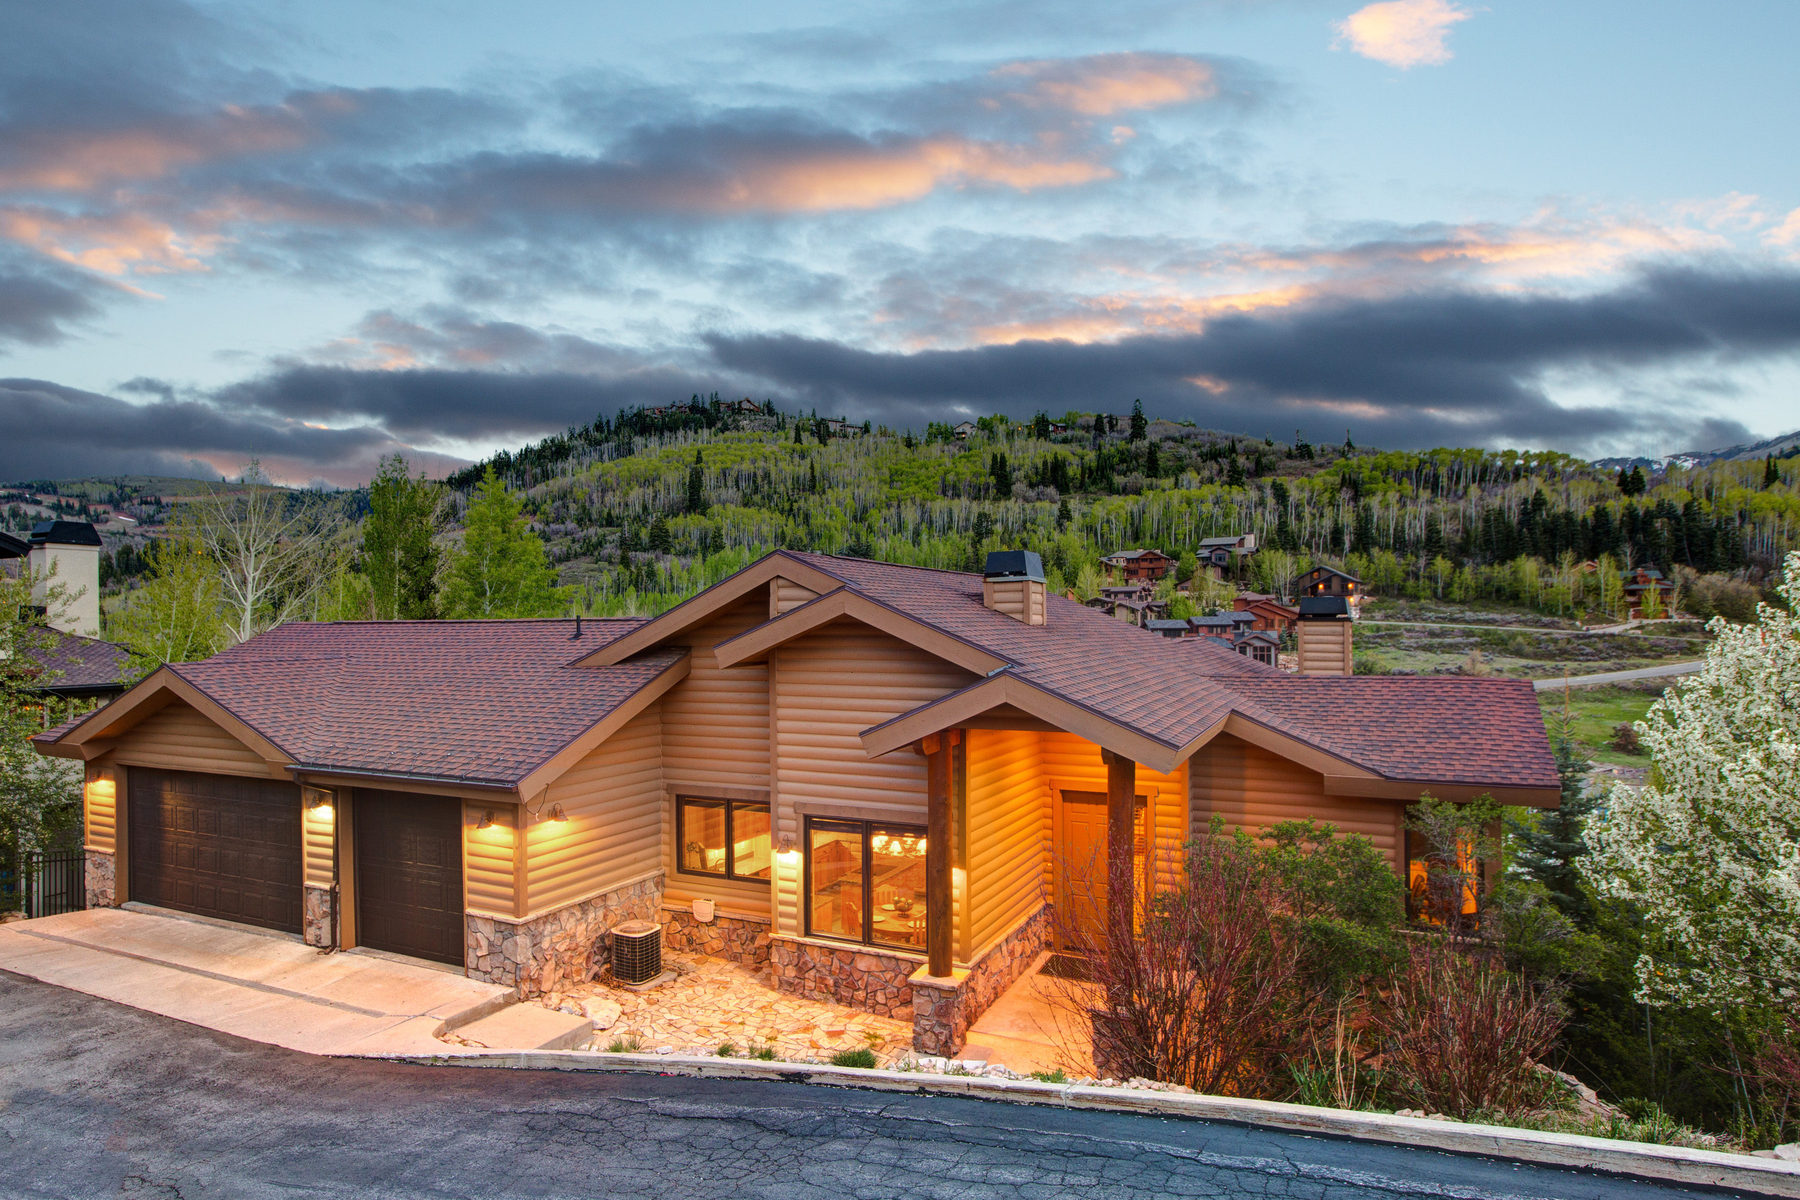 独户住宅 为 销售 在 Gold Coast views from this Ski Retreat 642 Sunnyside Dr Park City, 犹他州 84060 美国